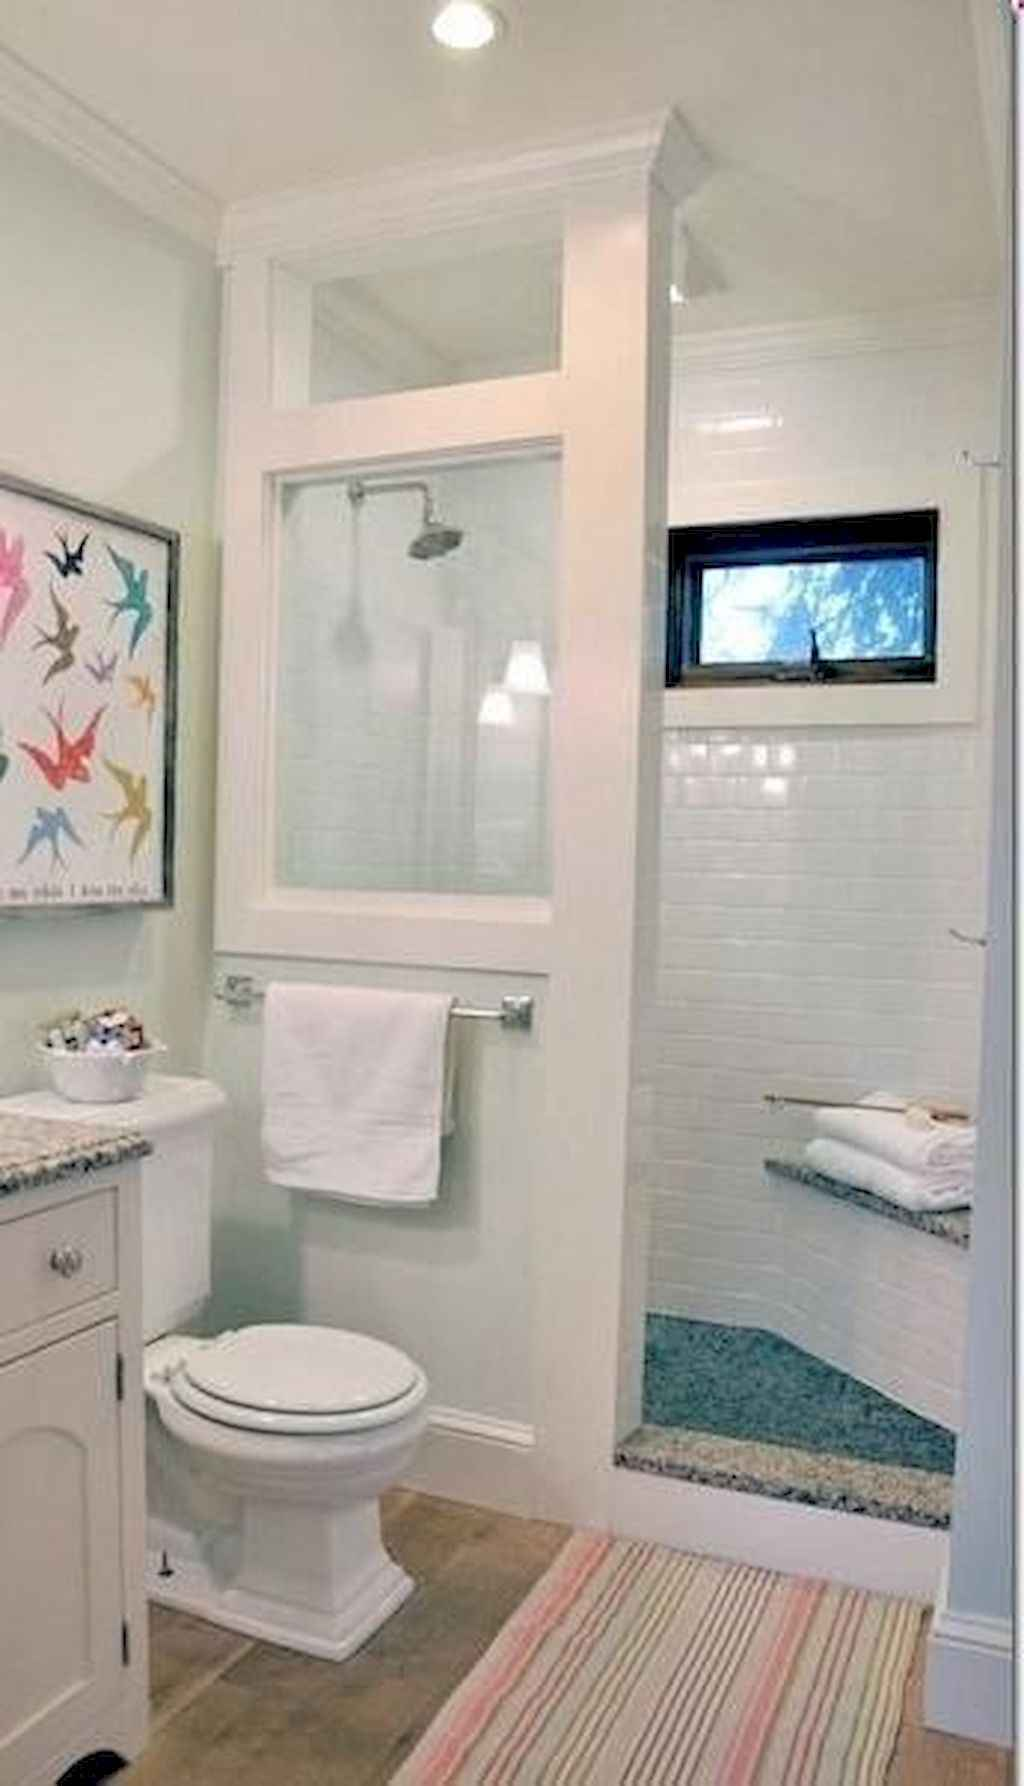 111 Brilliant Small Bathroom Remodel Ideas On A Budget (101)